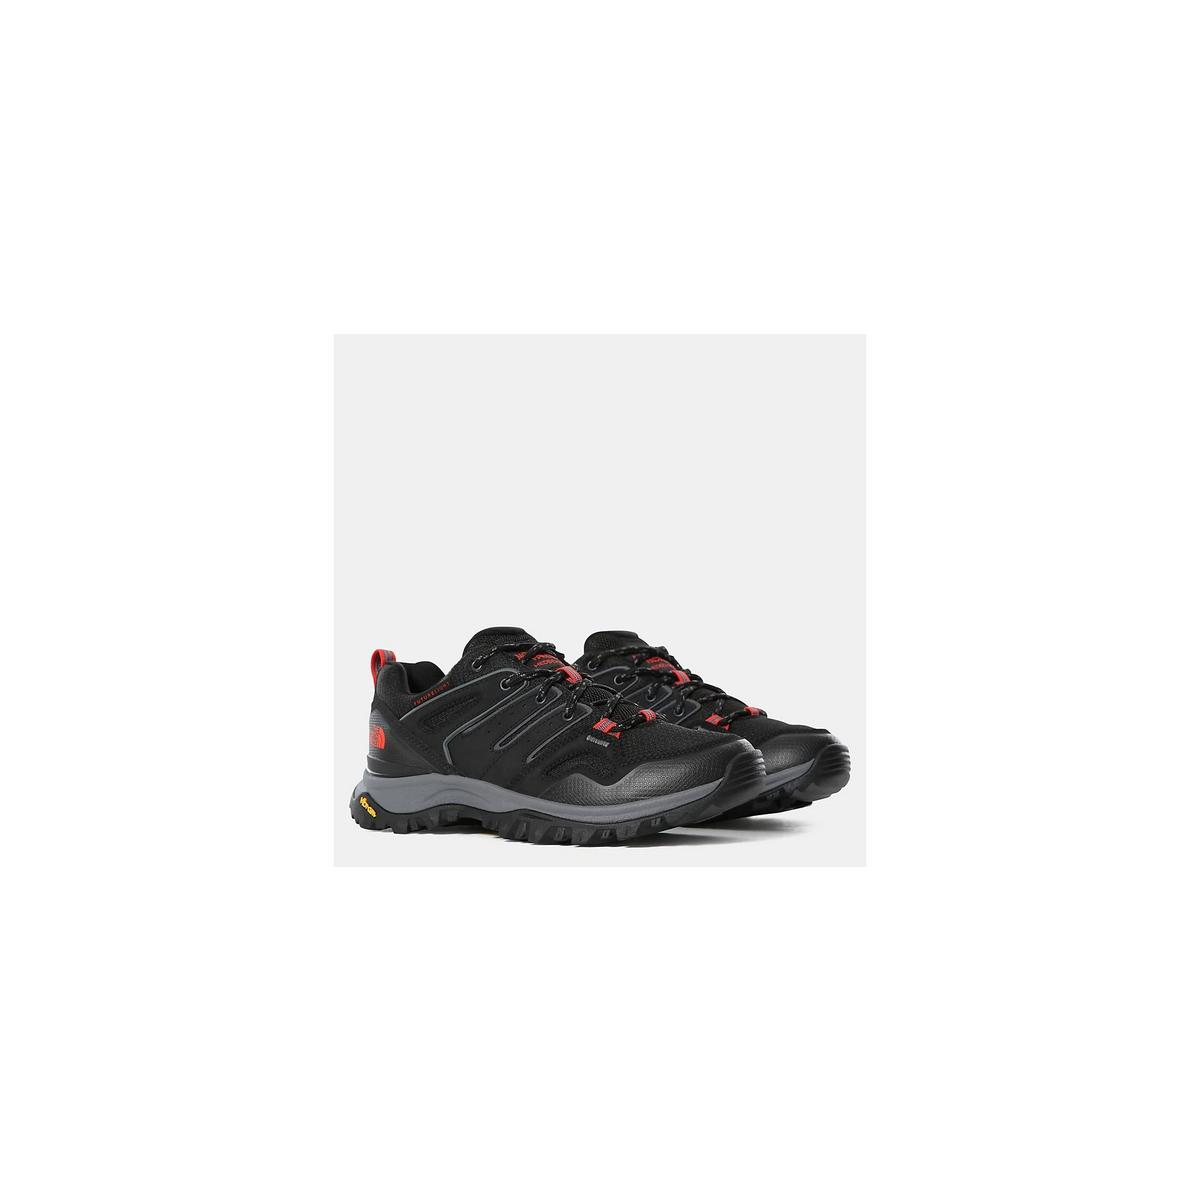 The North Face Women's Hedgehog Futurelight Shoes - TNF Black/Horizon Red